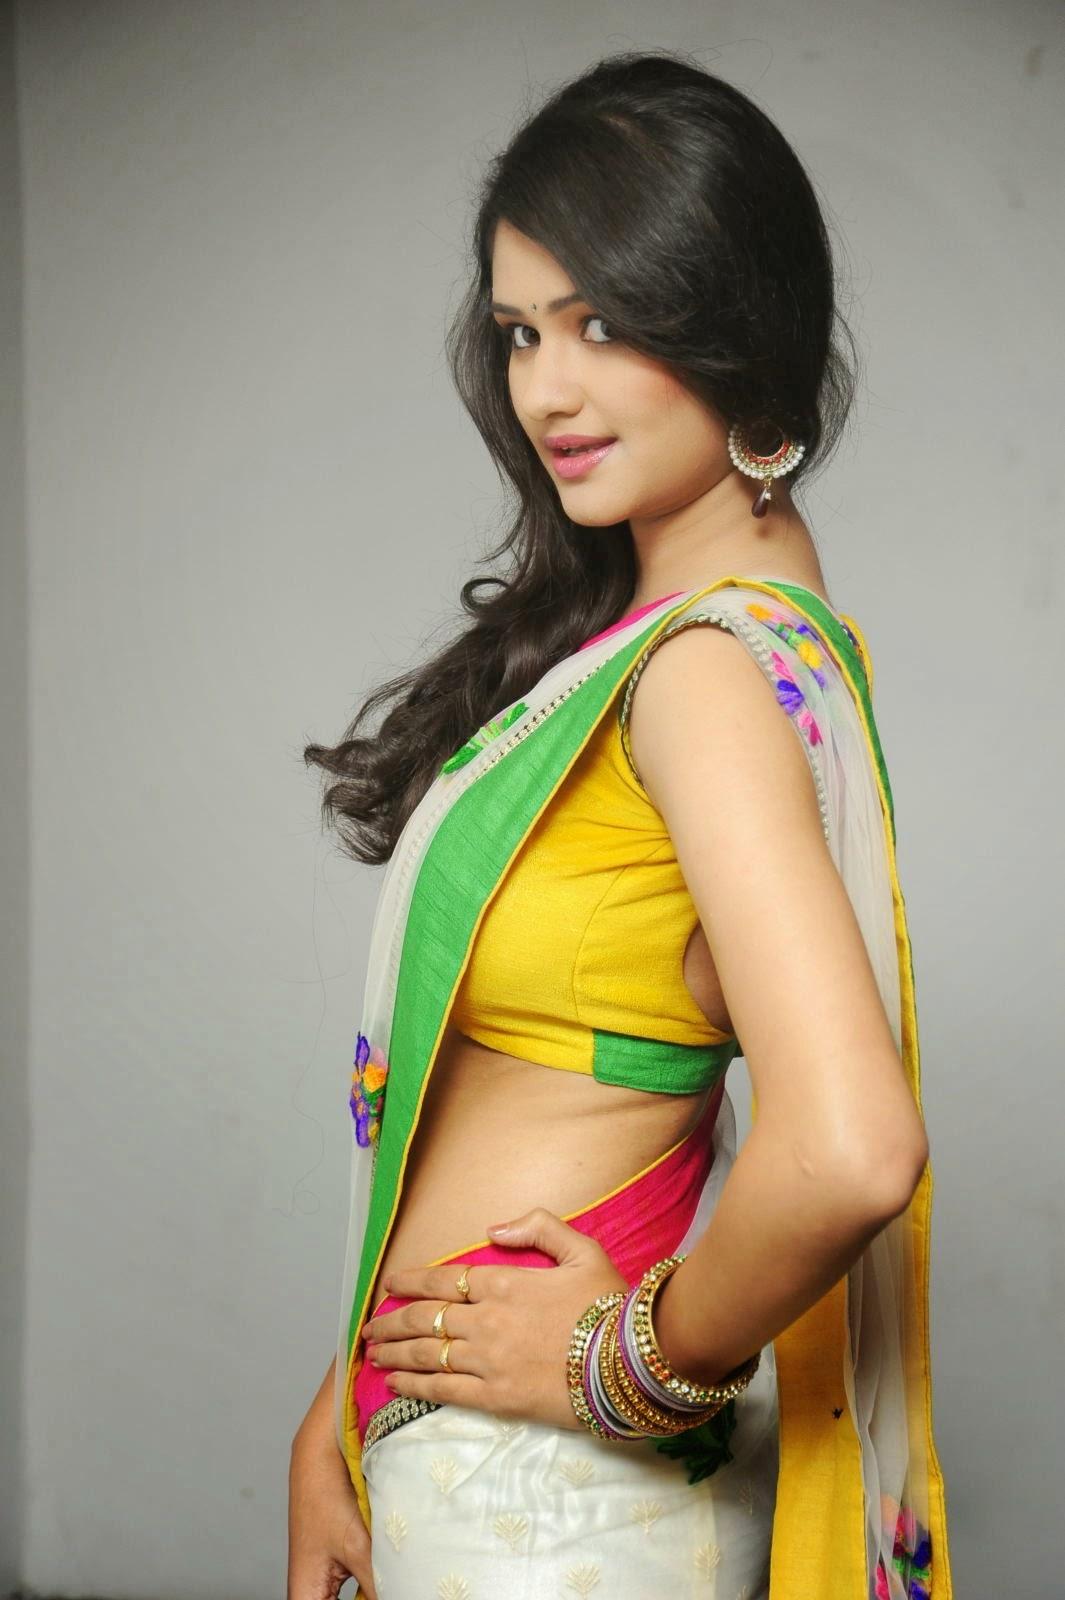 Priyanka Chopra Hot Bikini, Bra, Swimsuit, Navel, Cleavage